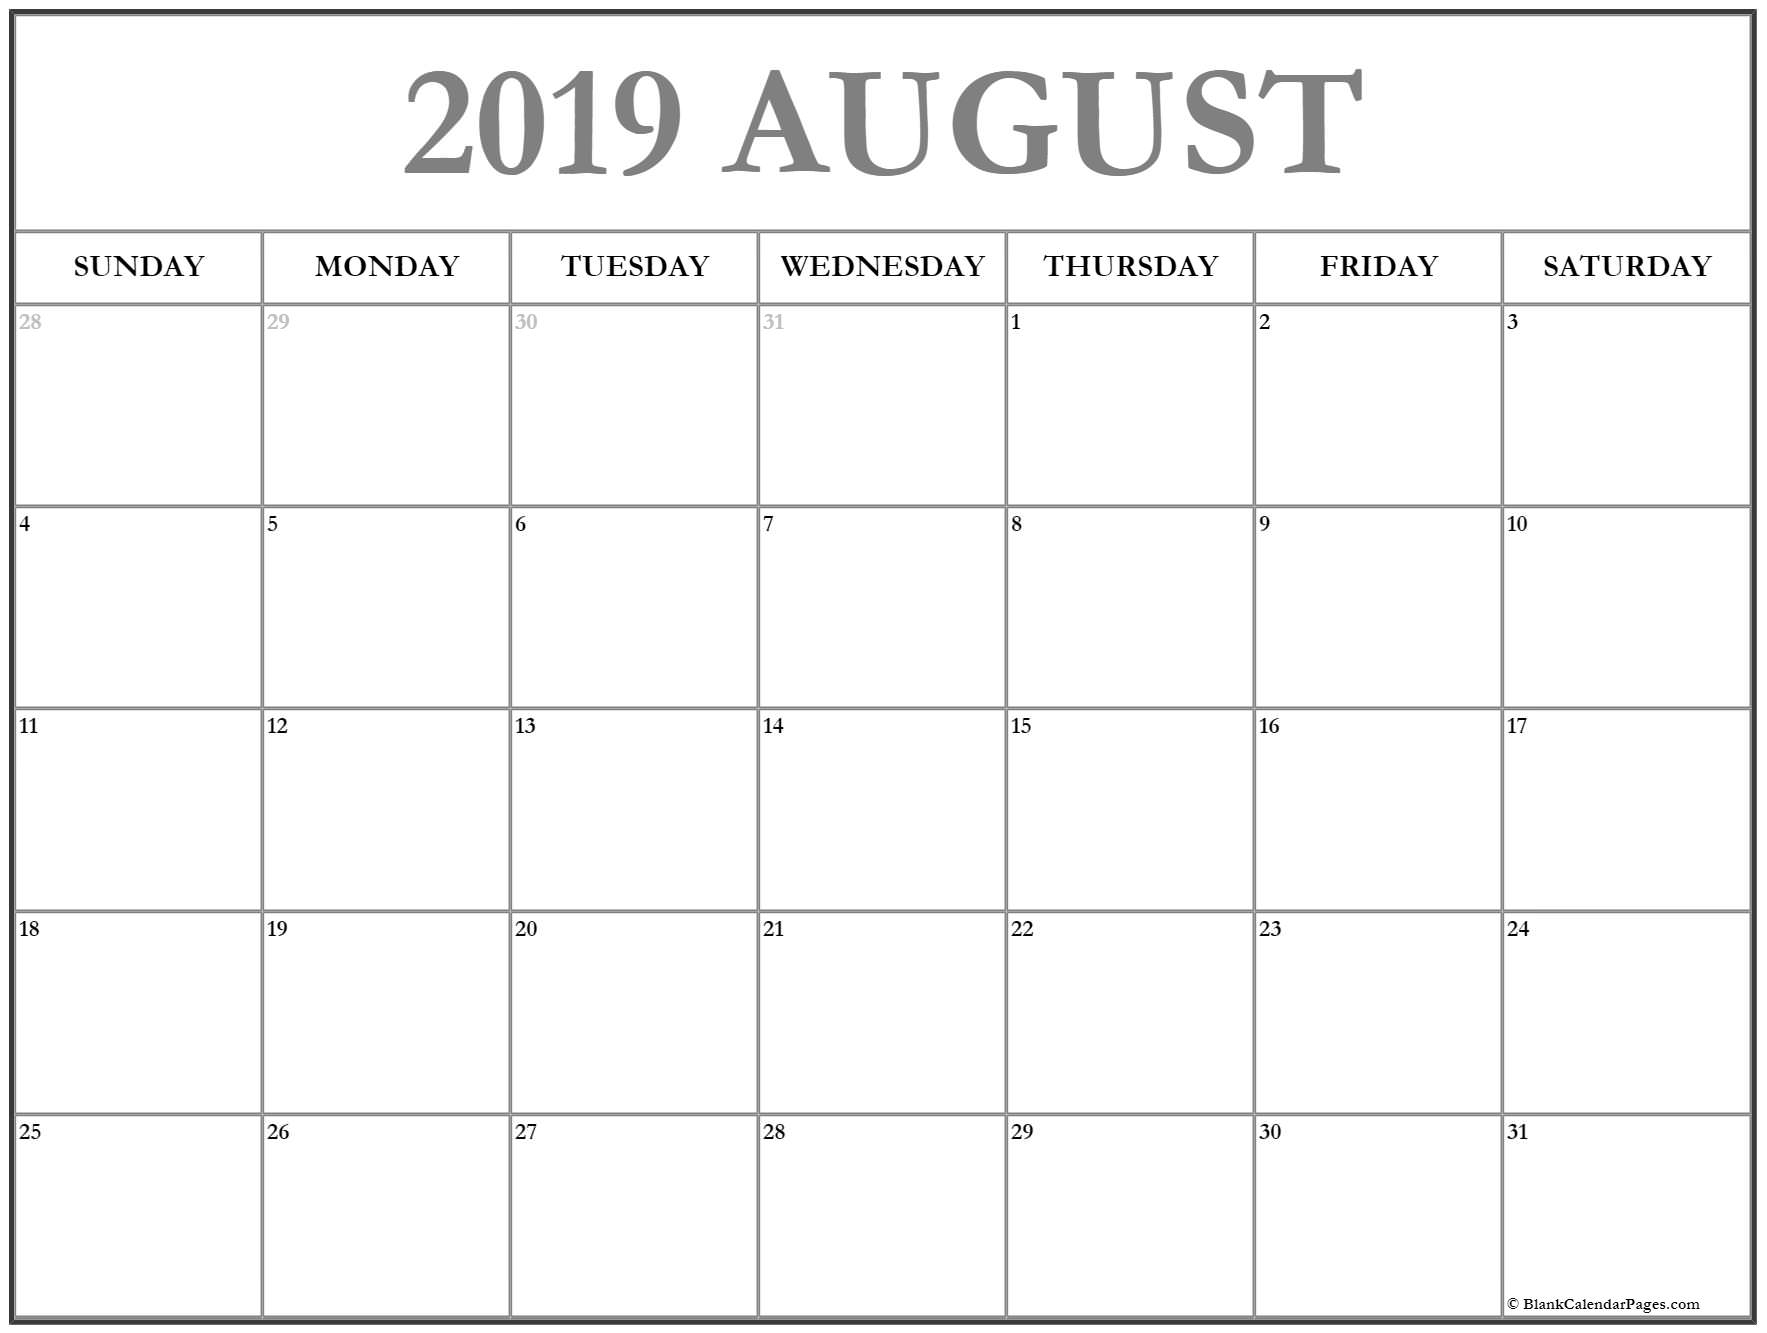 August 2019 Calendar | Free Printable Monthly Calendars inside Aug Calendar Clip Art Template